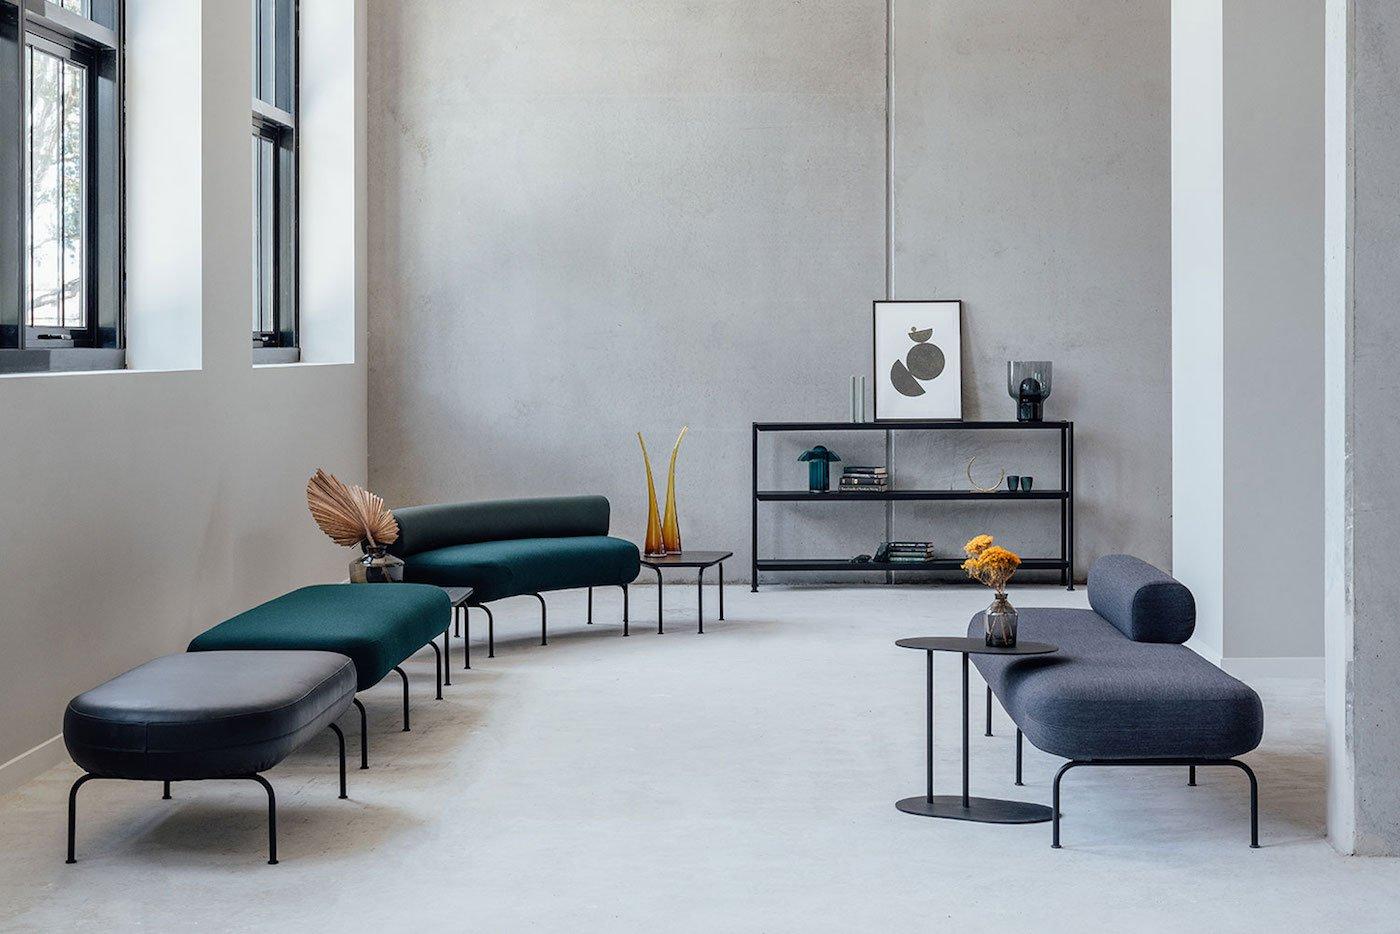 Eco Edition_Instyle_Native_Architecture interiors 4